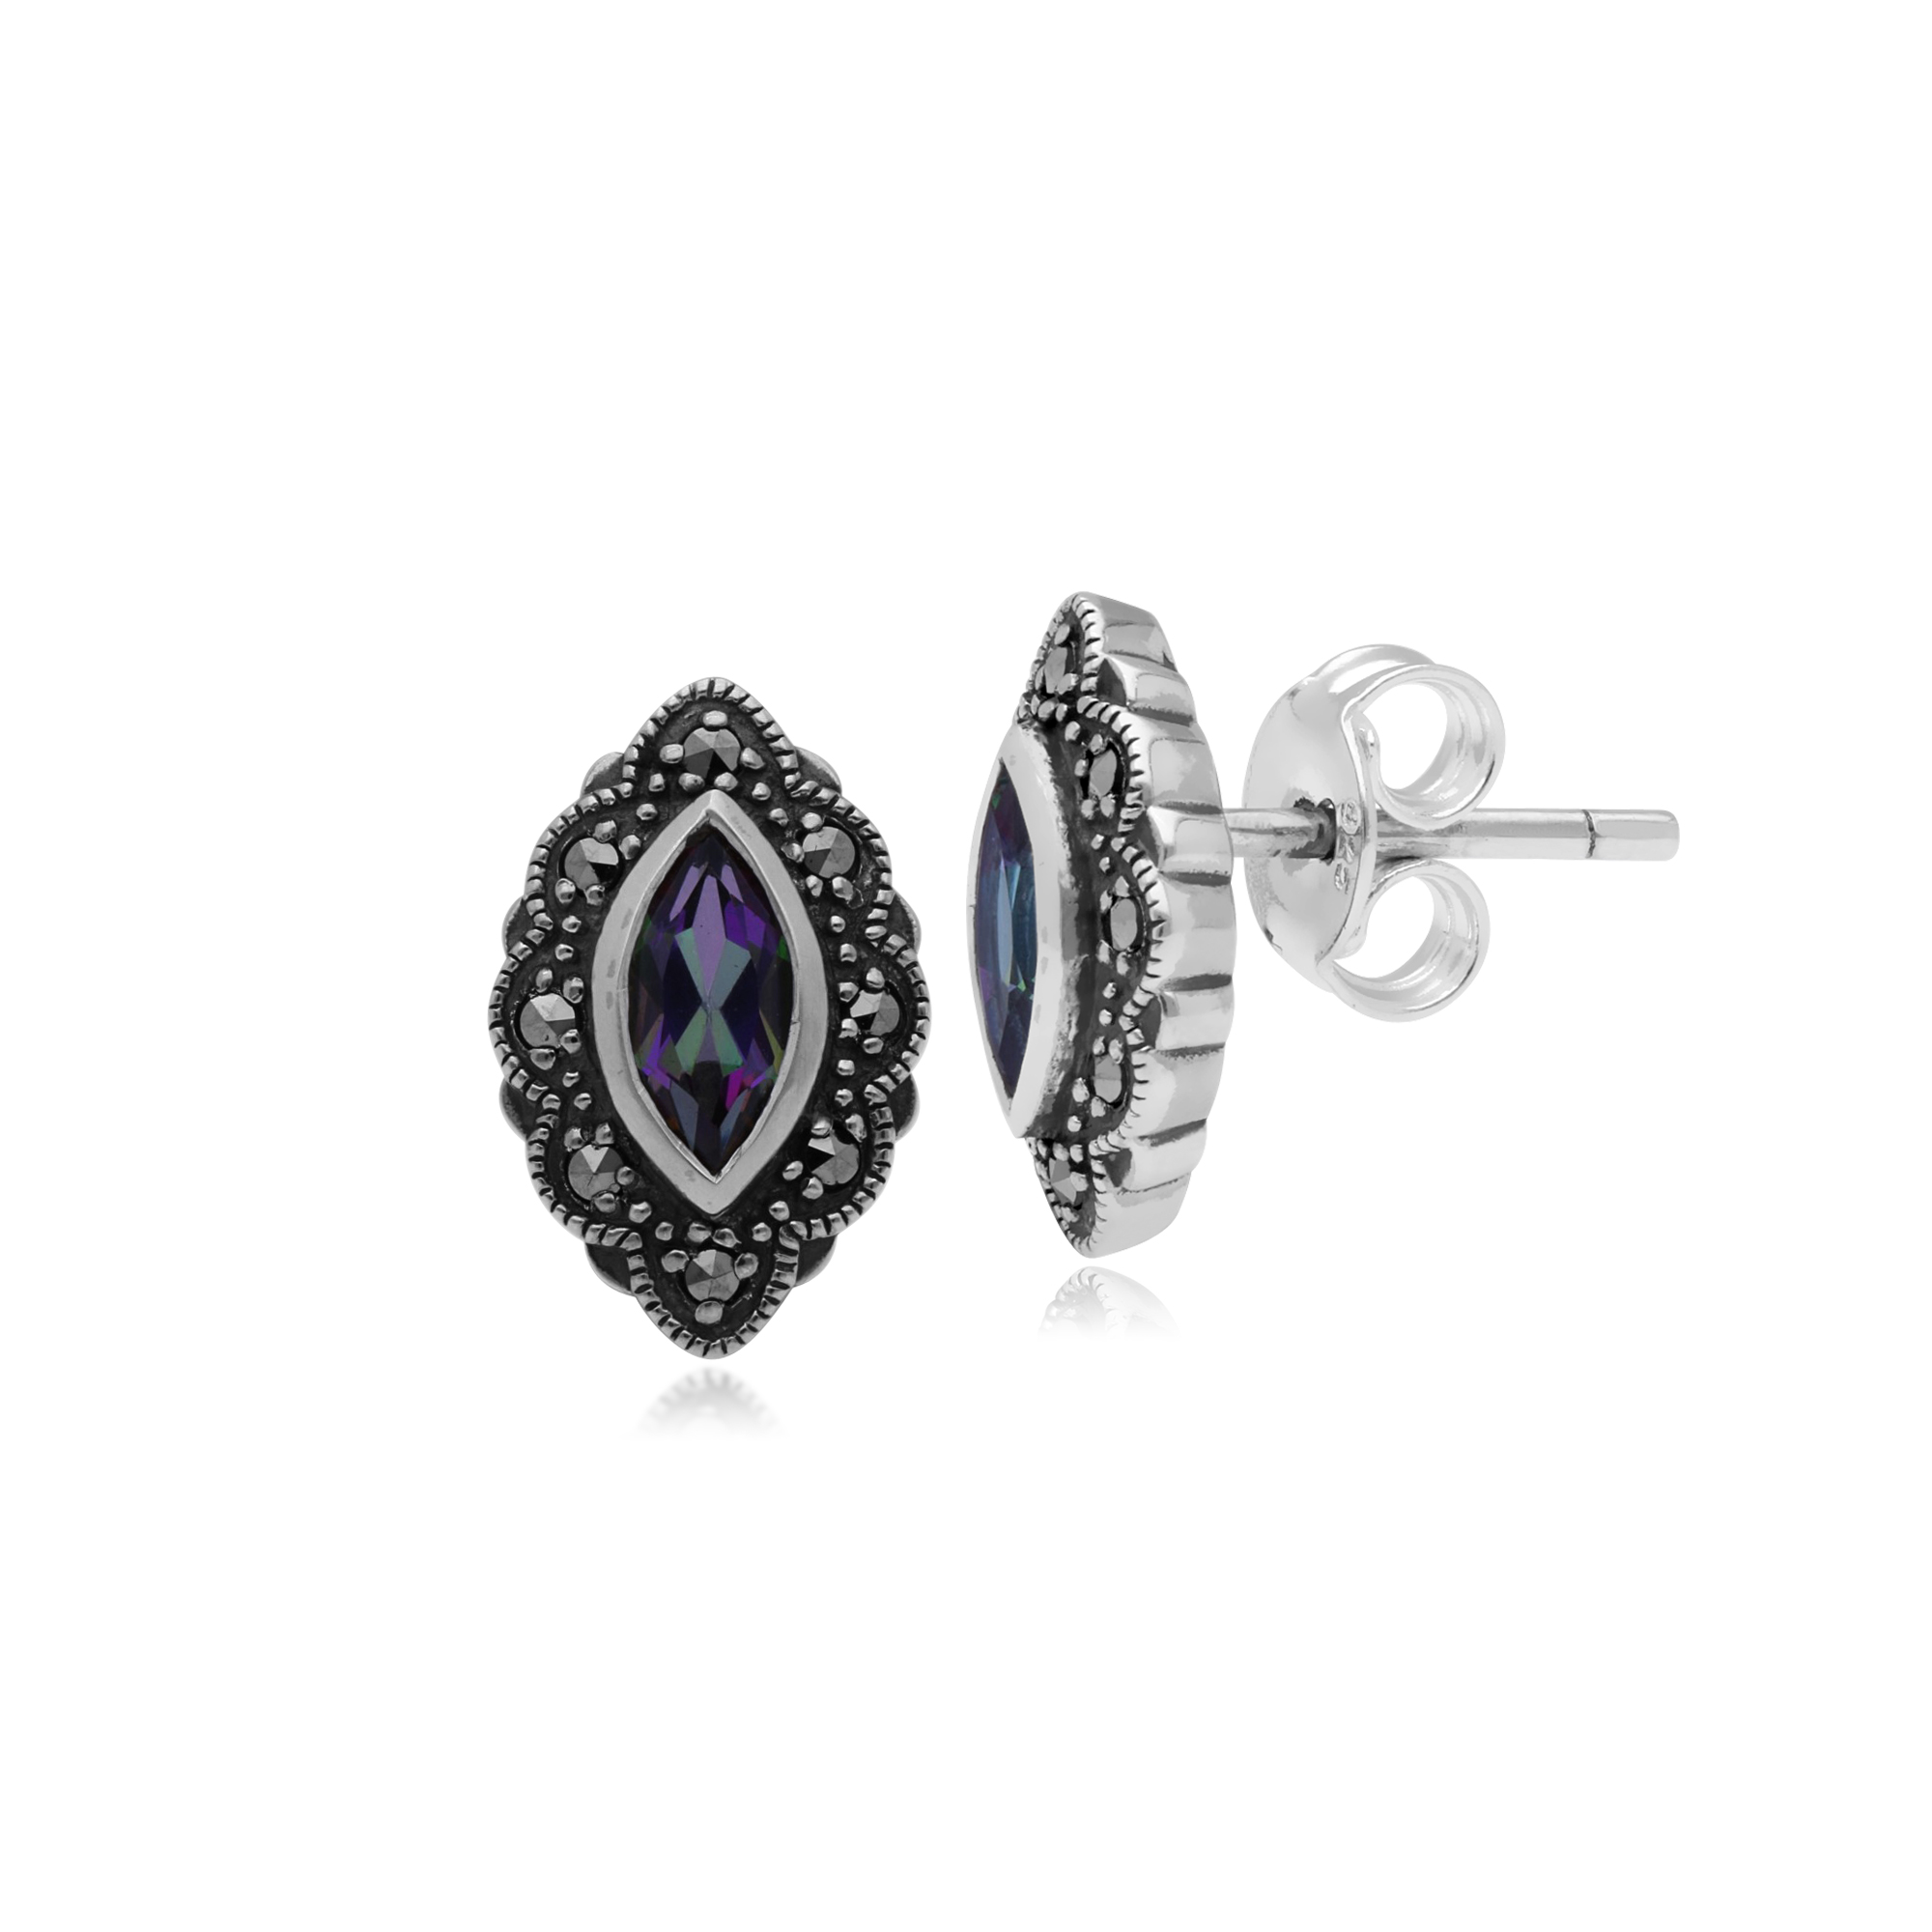 Gemondo 925 Sterling Silver Art Deco Mystic Green Topaz /& Marcasite Ring